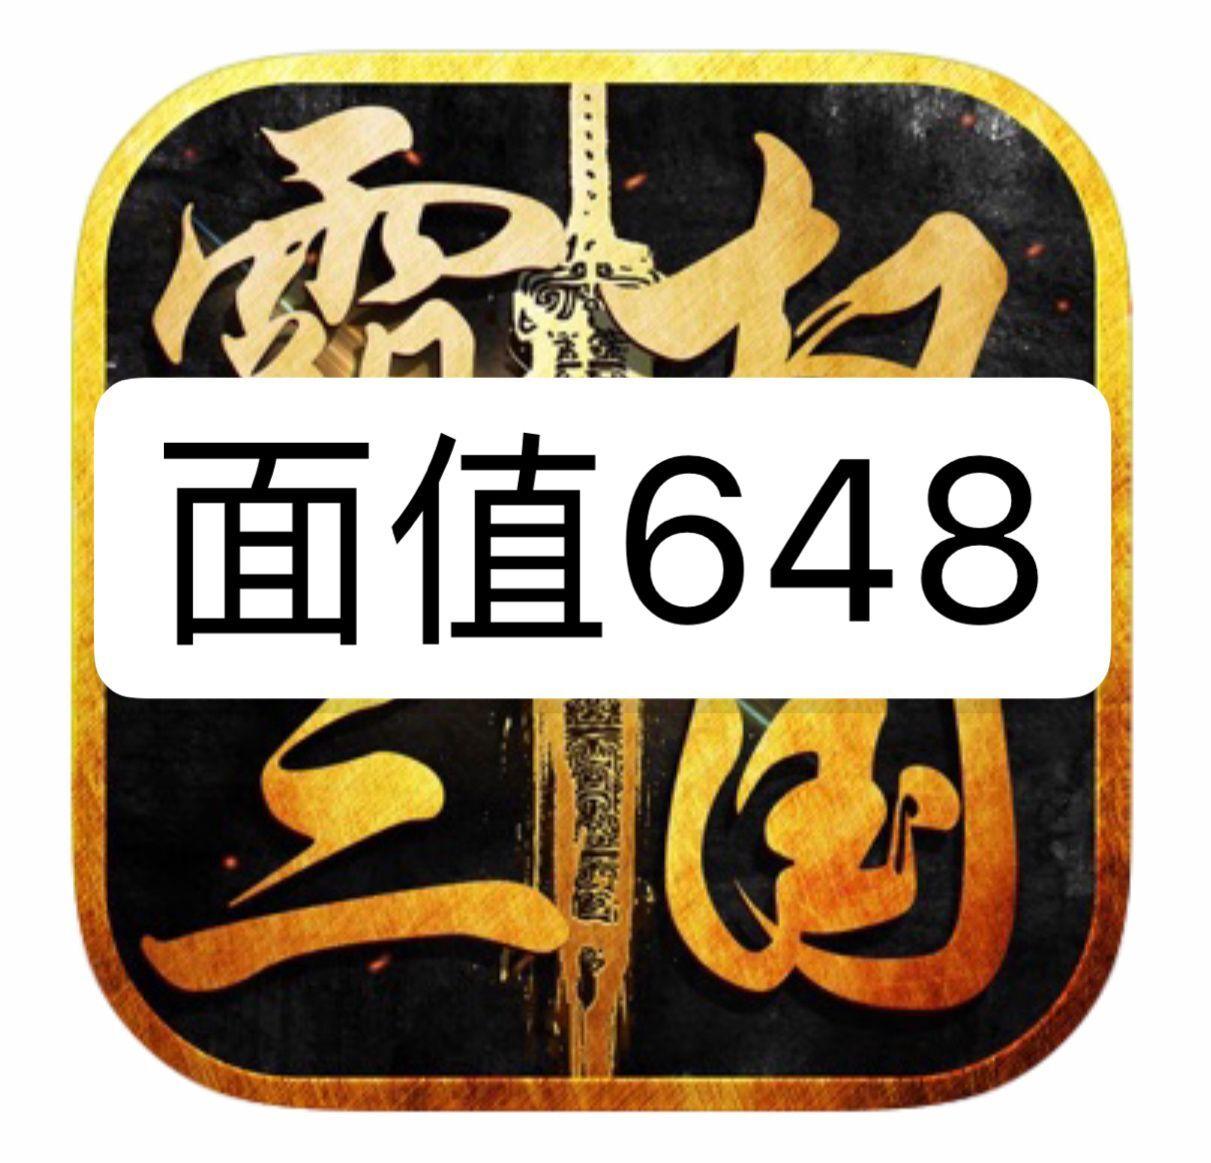 Внутриигровые ресурсы The Three Kingdoms hegemony Артикул 586229024141